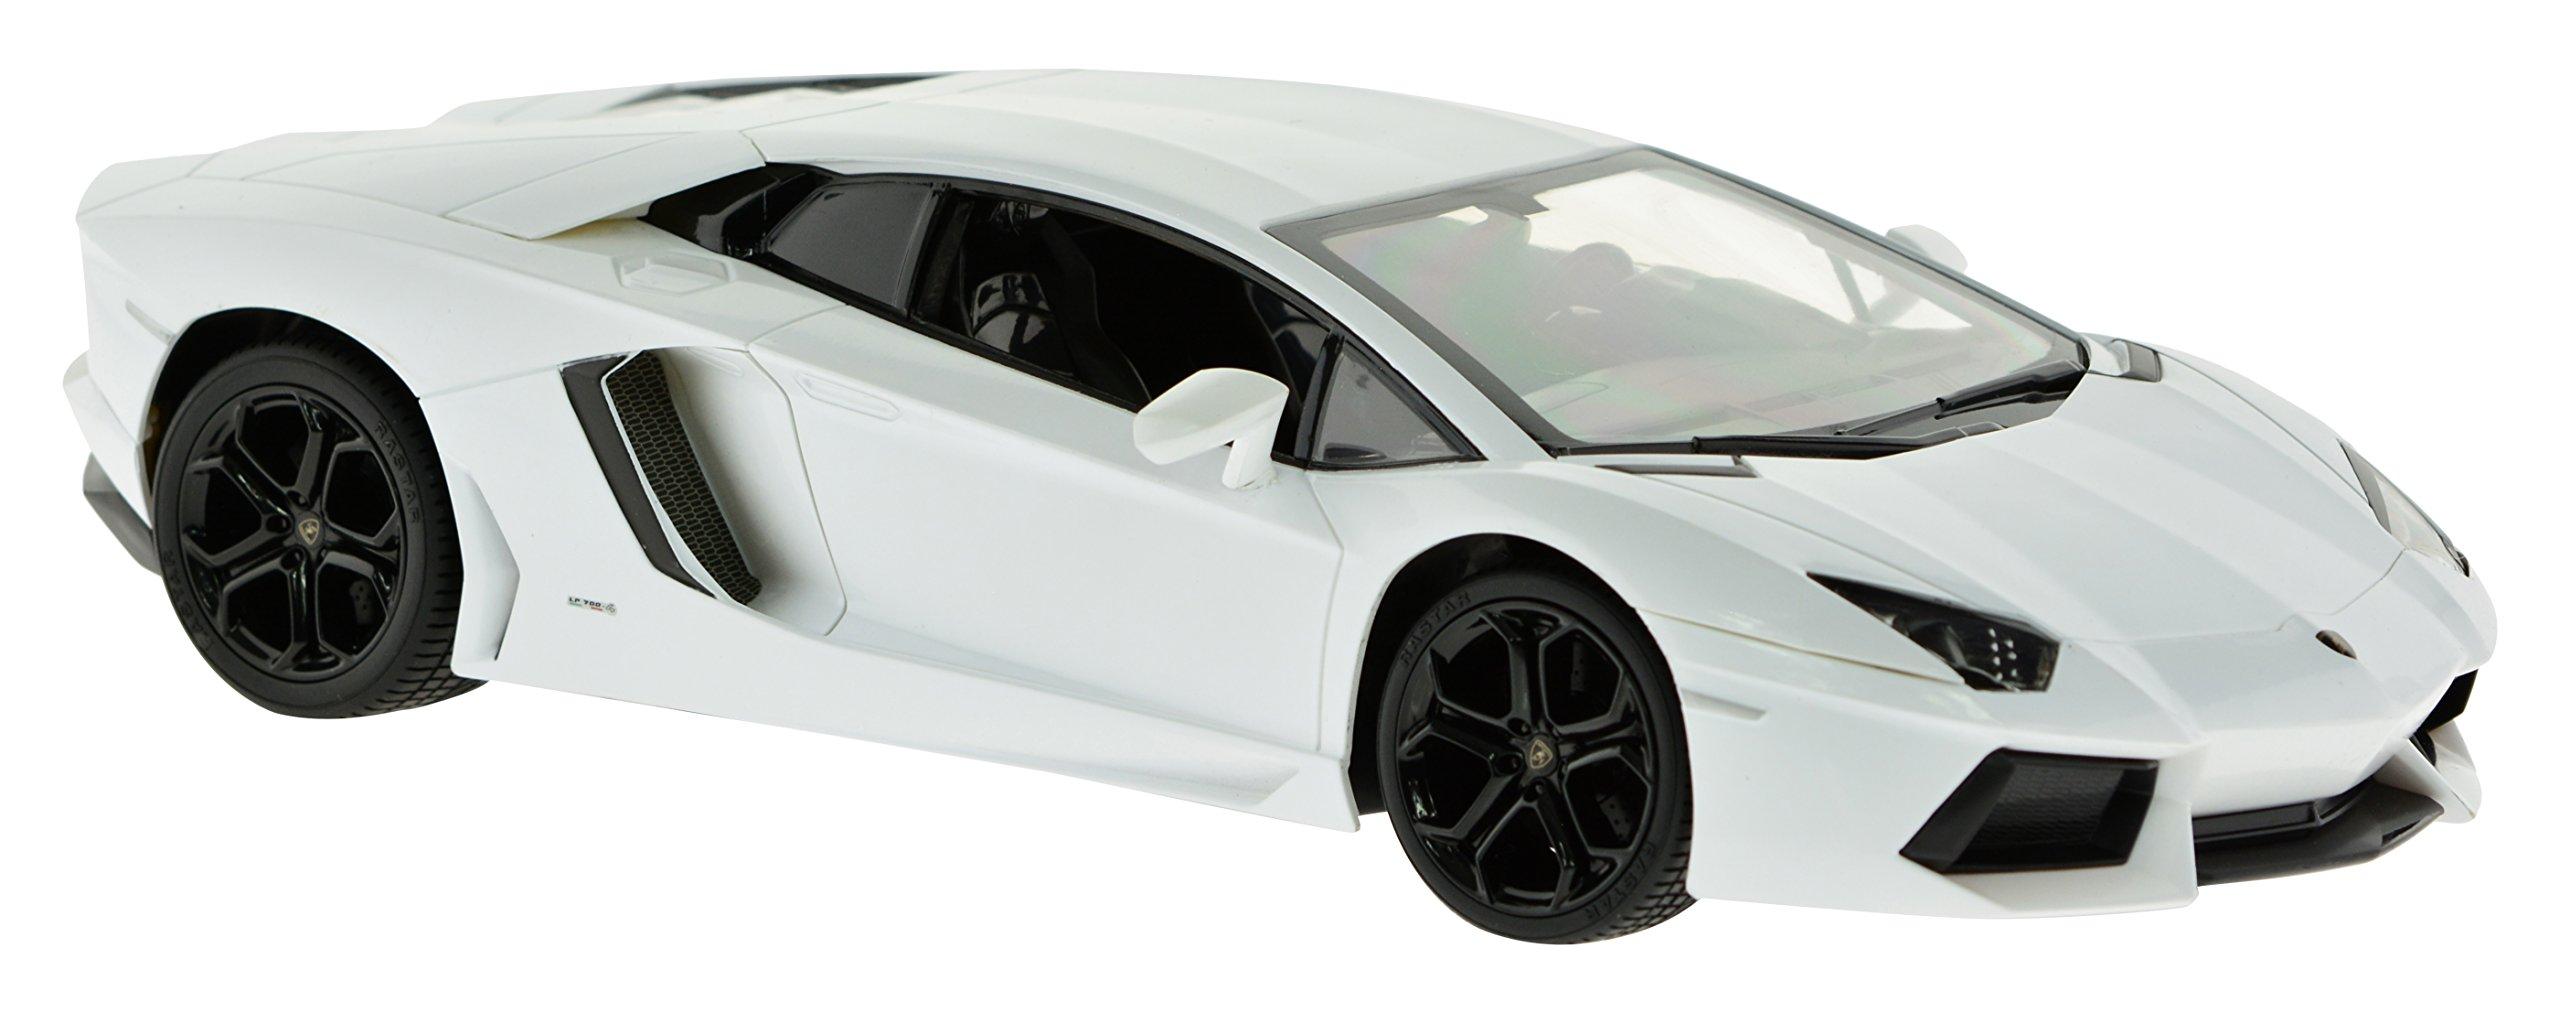 Carmel 1:14 Lamborghini Aventador Lp700 2.4Ghz with Lights Rechargeable Battery, White